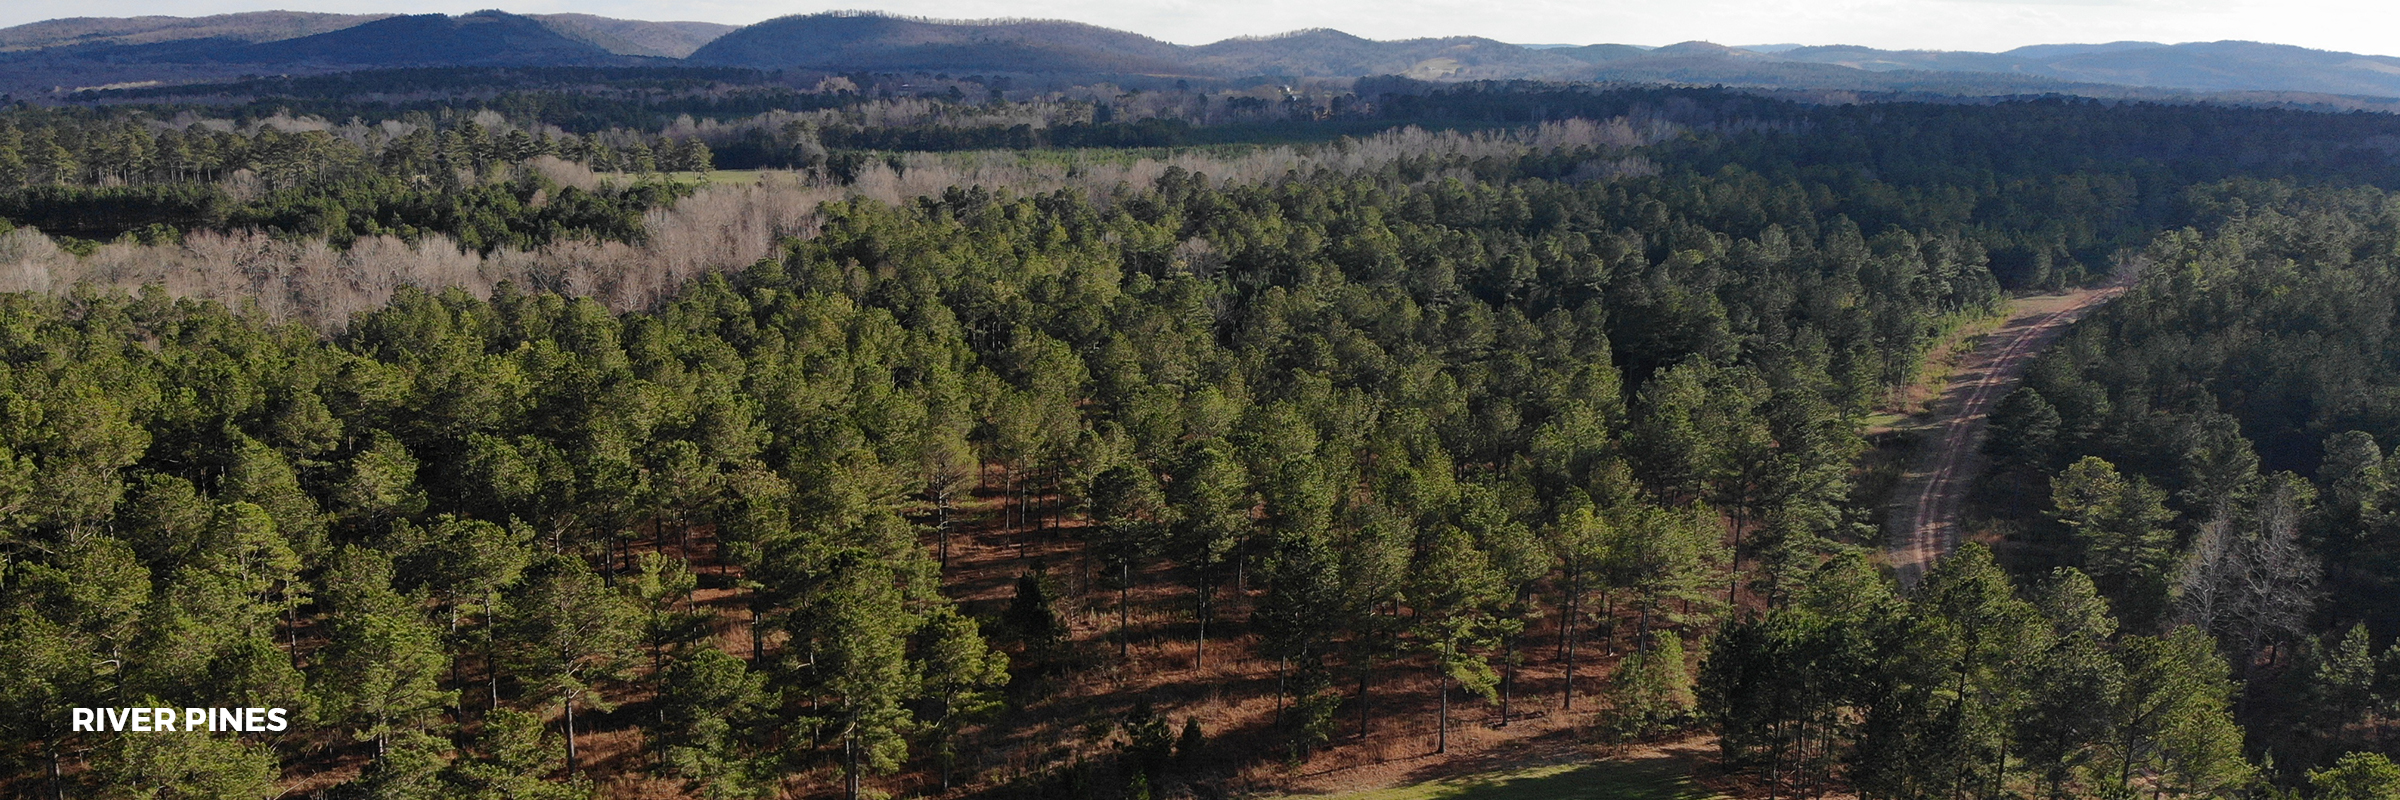 River-Pines.jpg